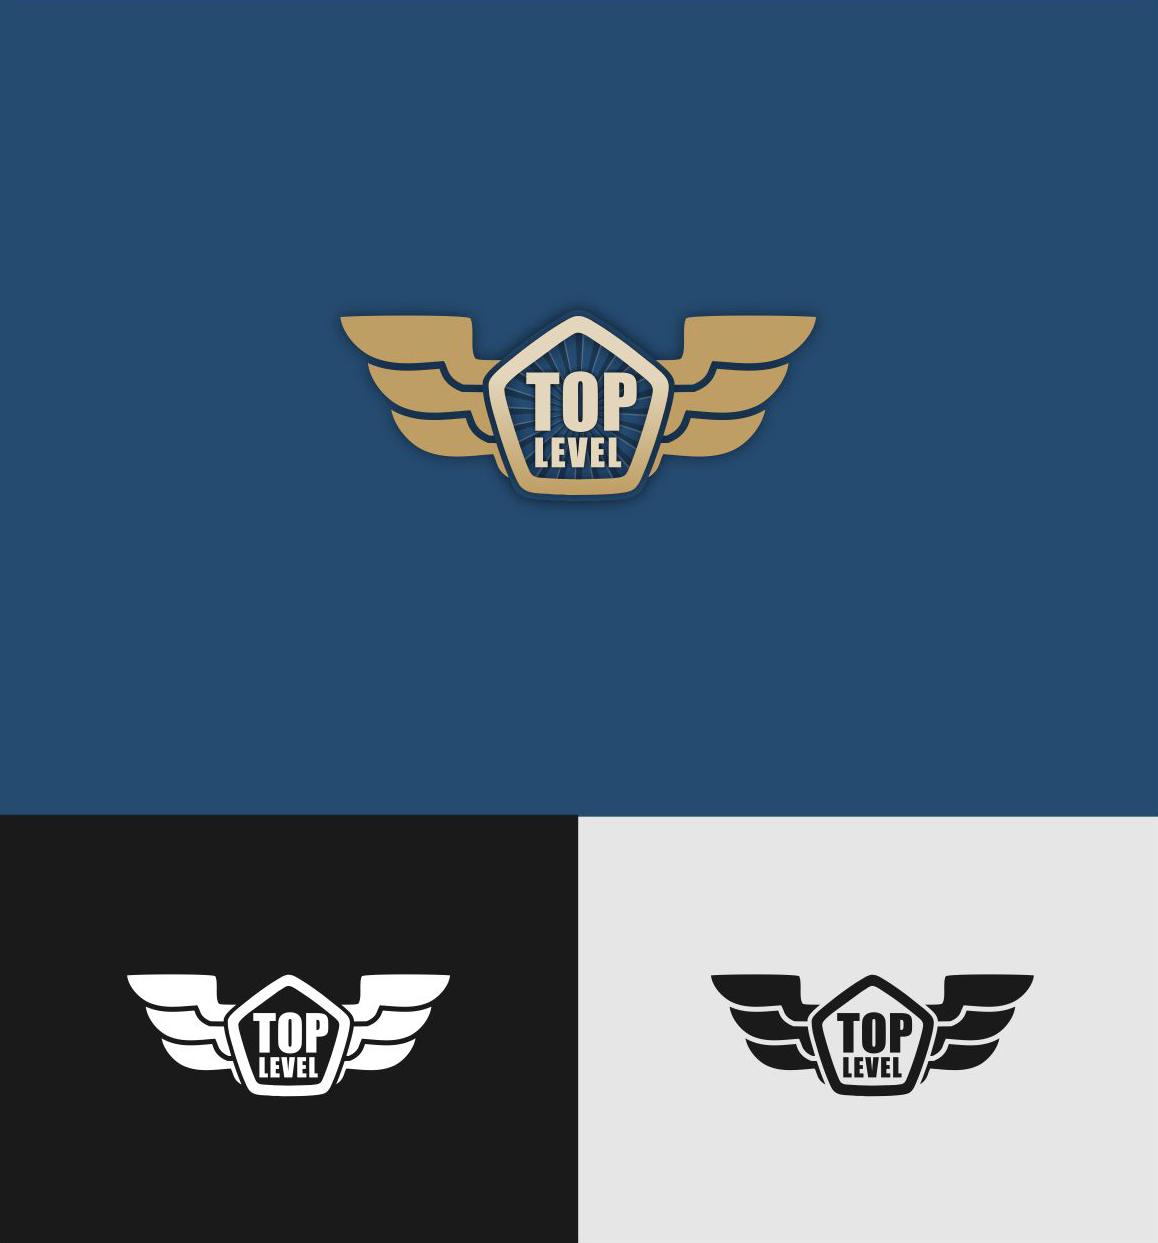 Разработка логотипа для тюнинг ателье фото f_3355f36a6baeb55d.jpg